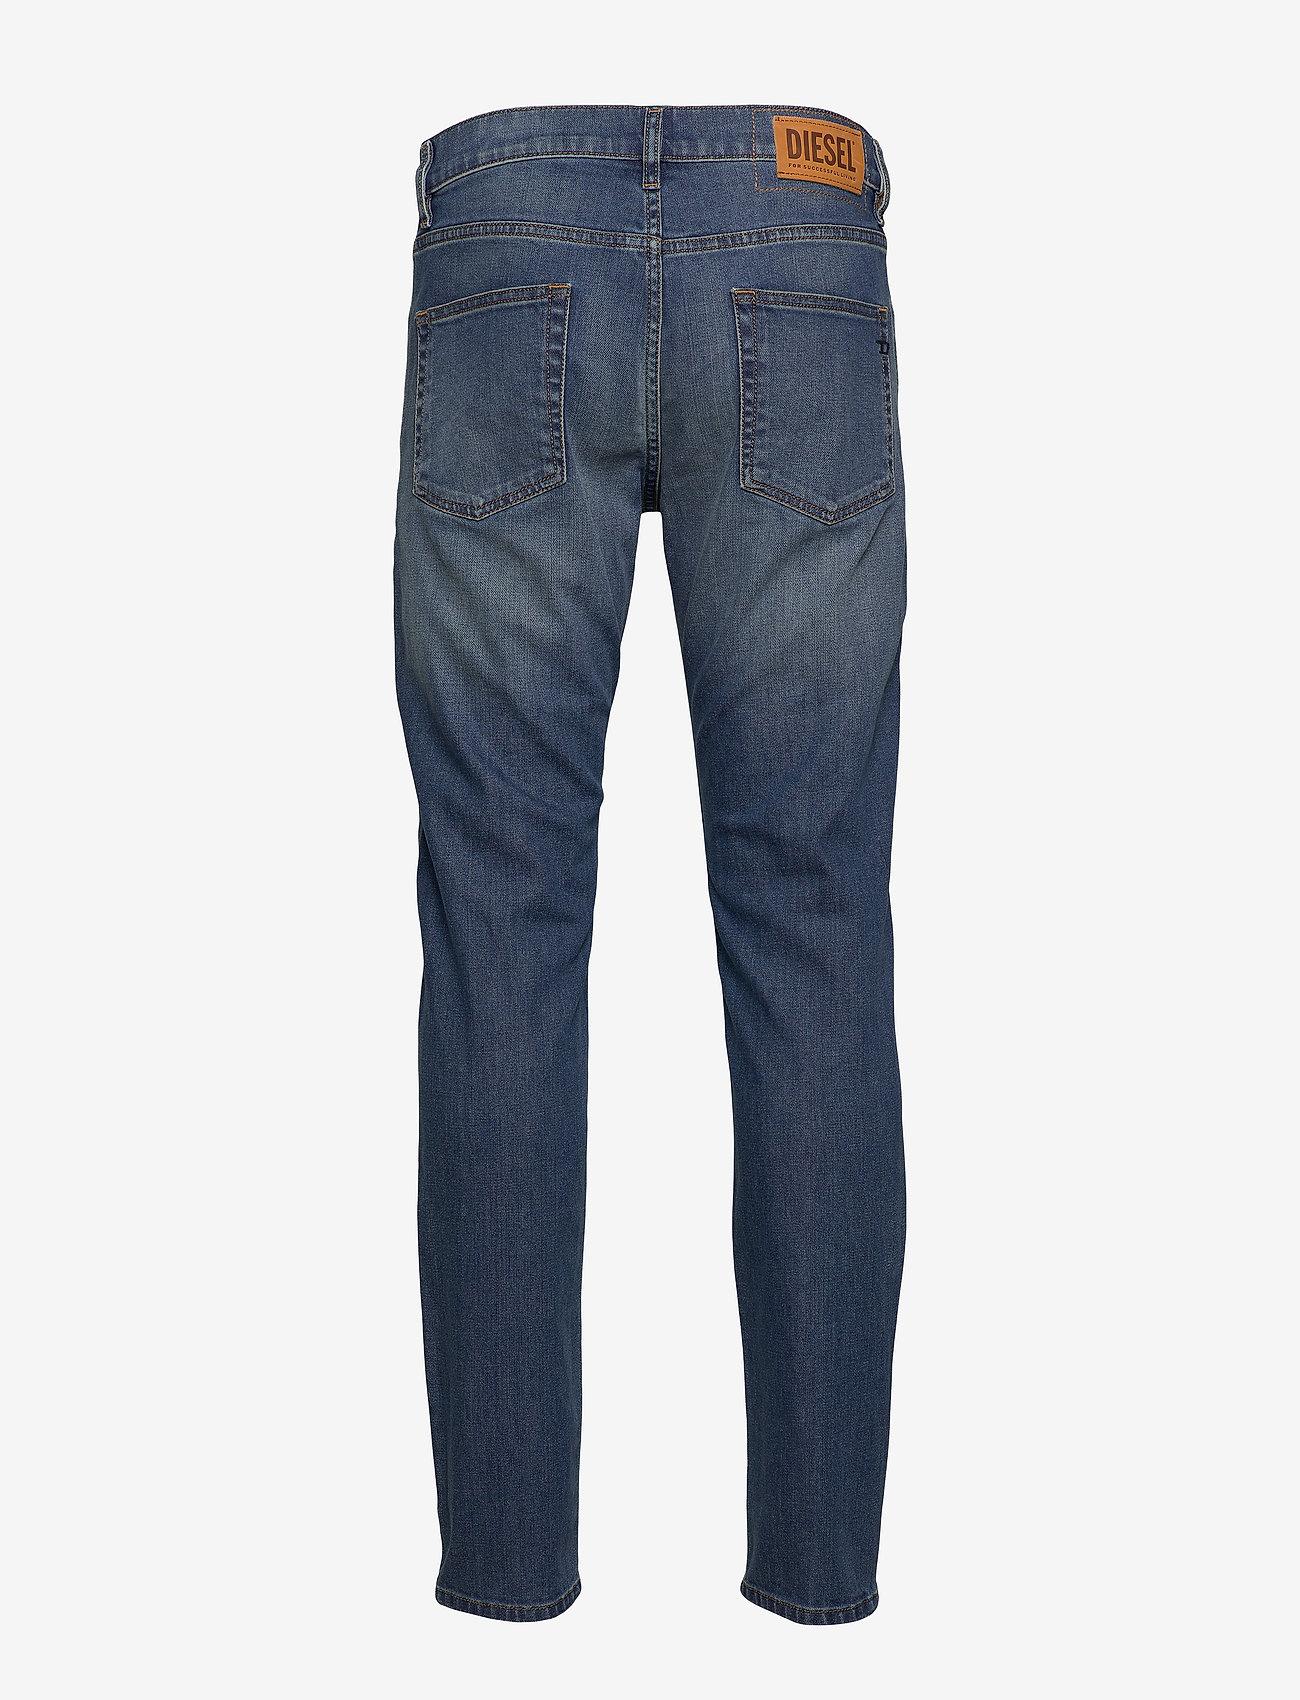 Diesel Men - D-STRUKT - slim jeans - denim - 1